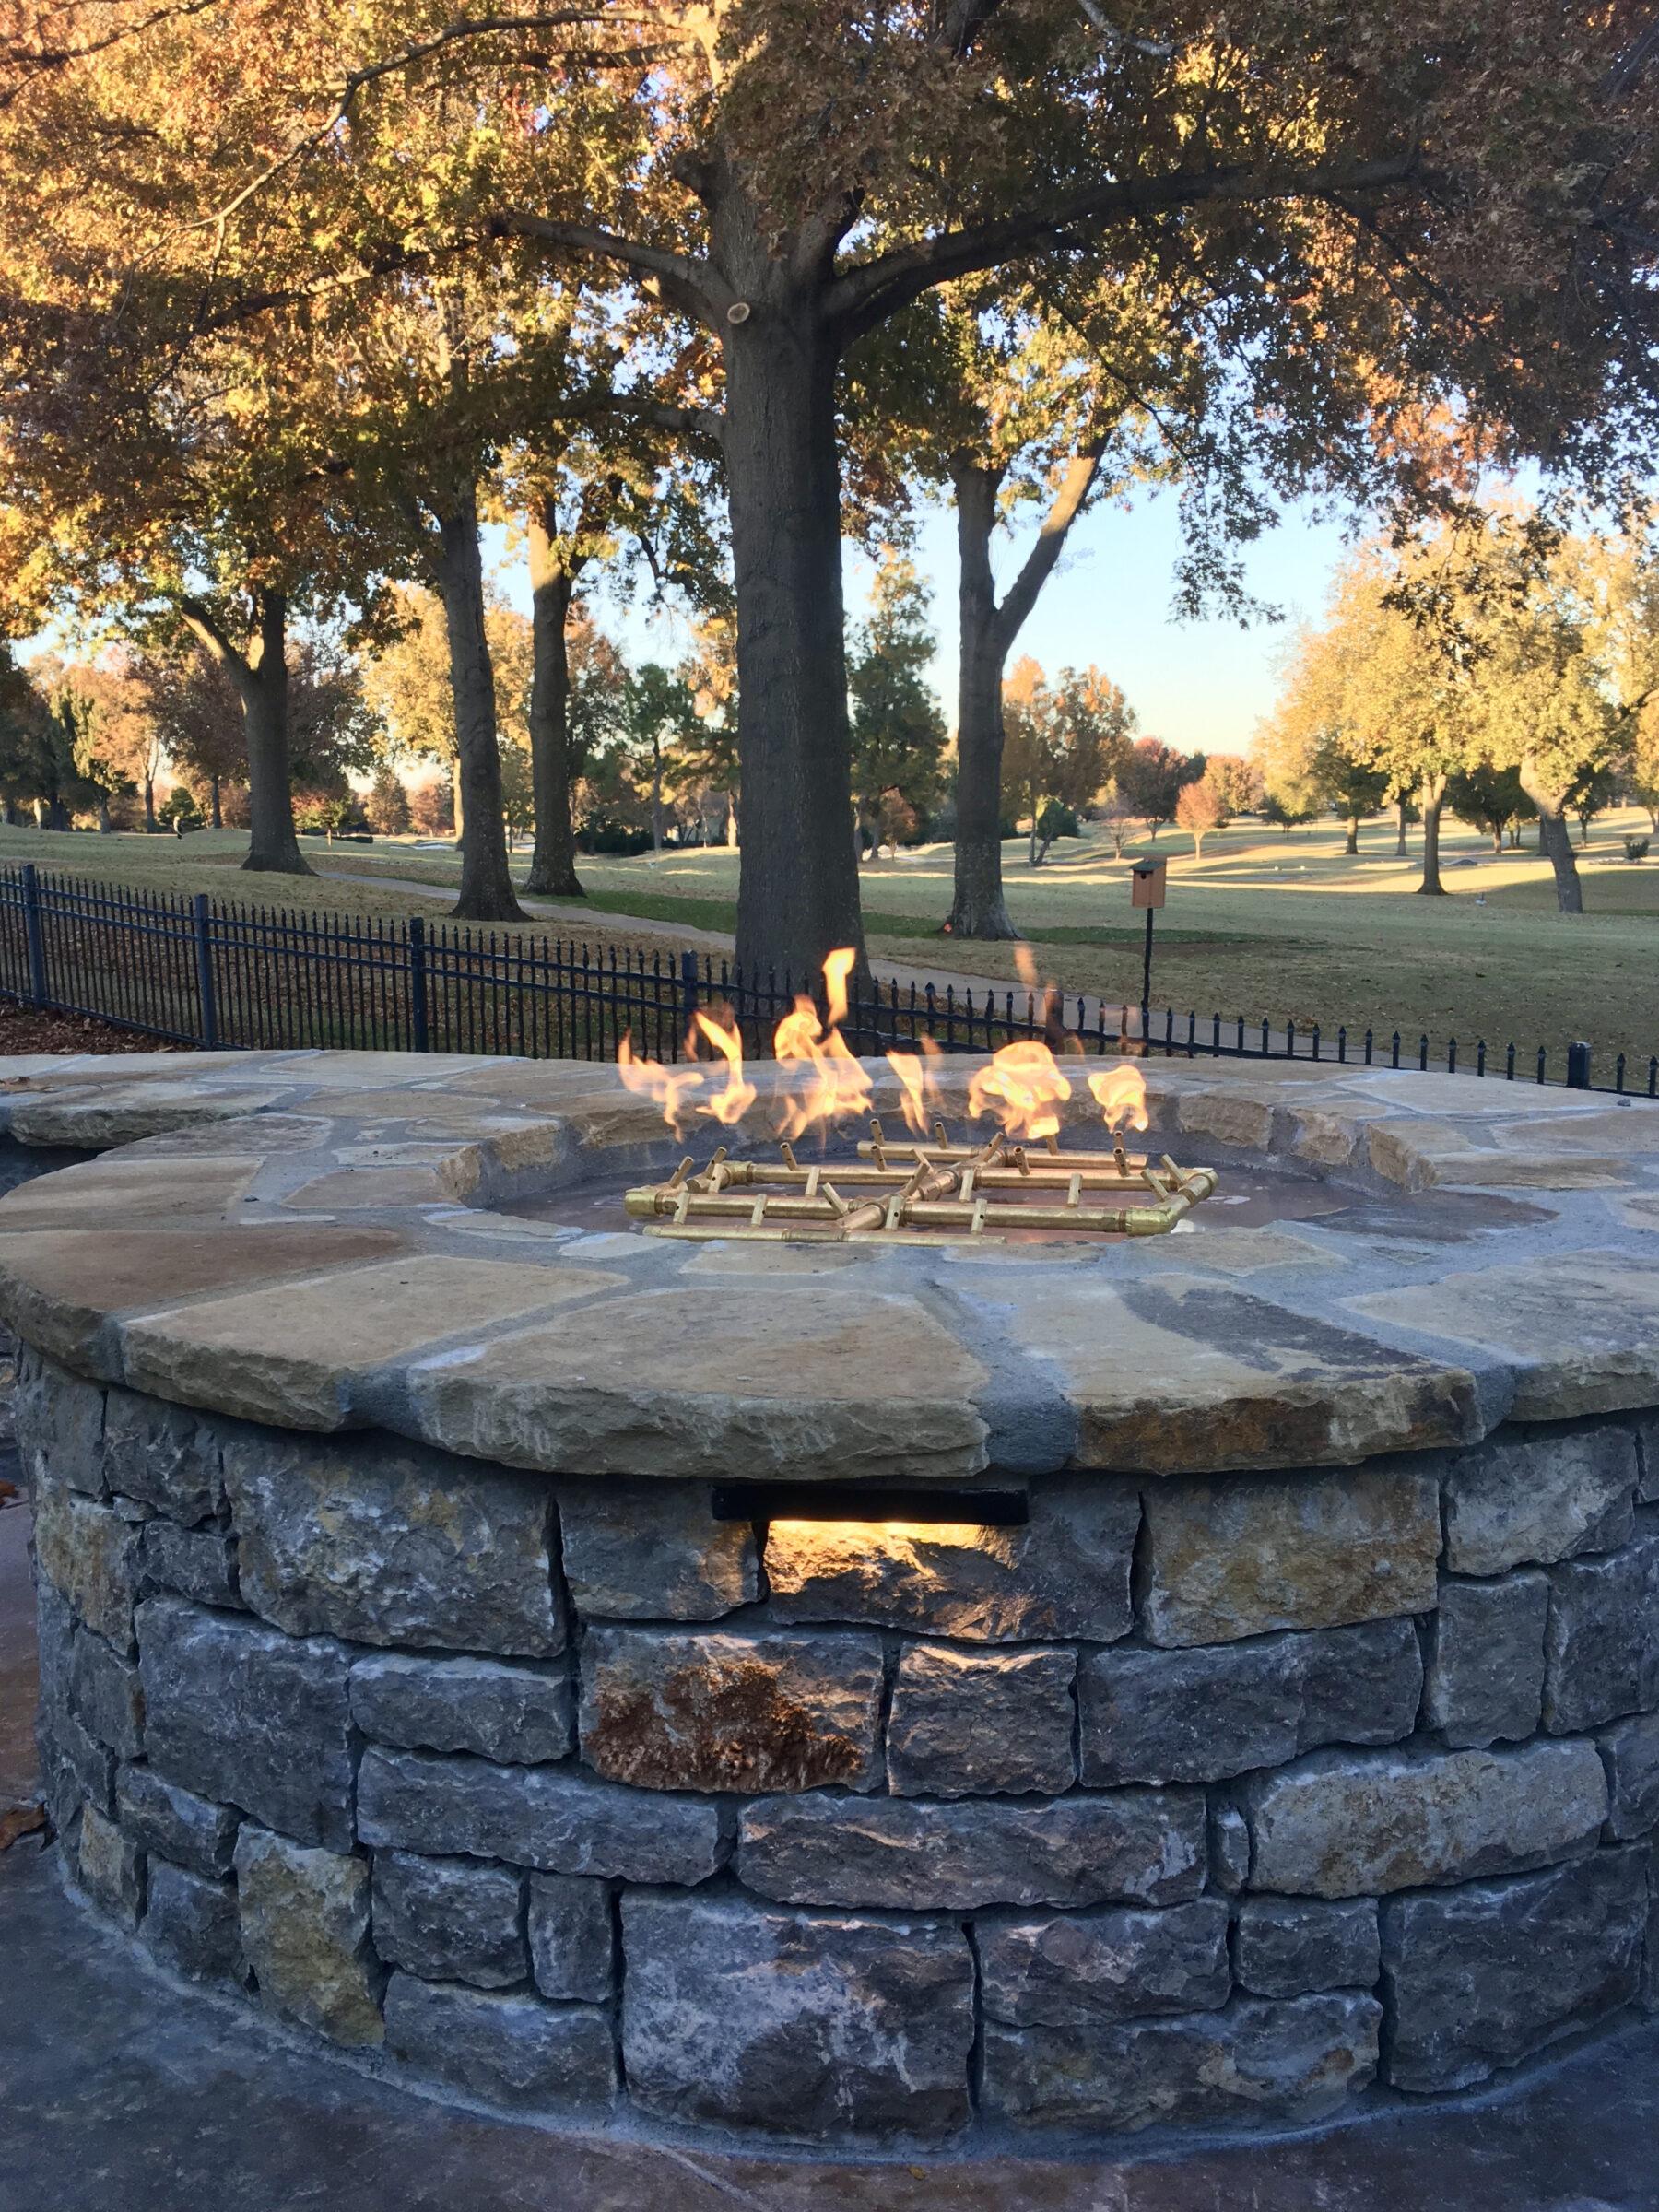 2018 11 14 Tulsa OK Golfing Community Patio Extension Firepit 701712B6CABD